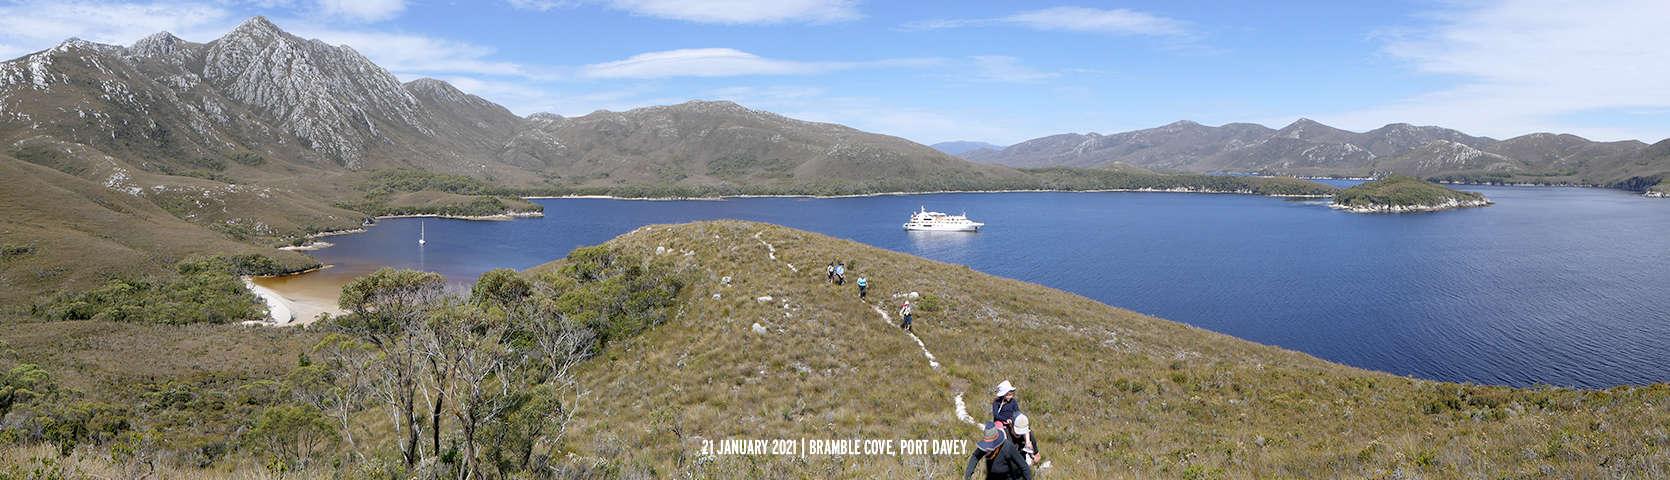 Coral Discoverer at Bramble Cove Port Davey 2021 Tasmania